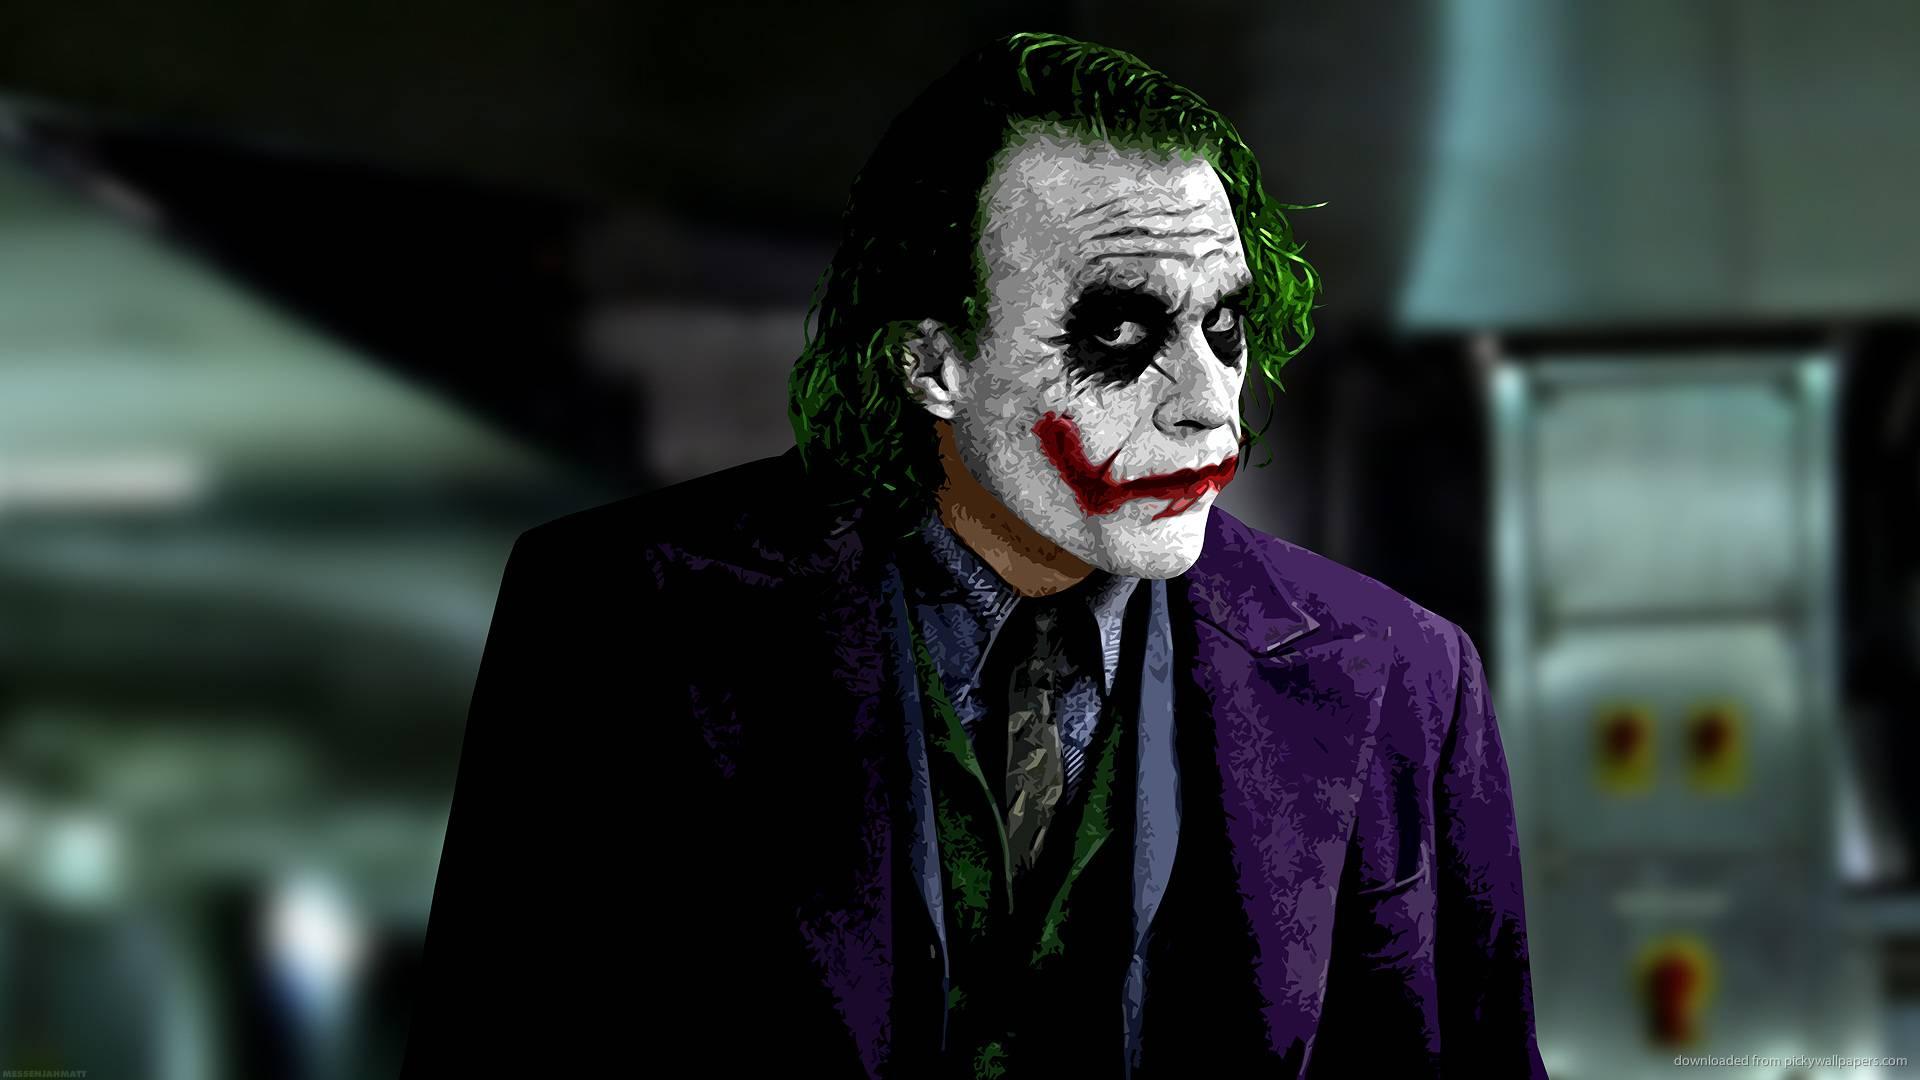 batman curious Joker batman curious Joker 1920x1080